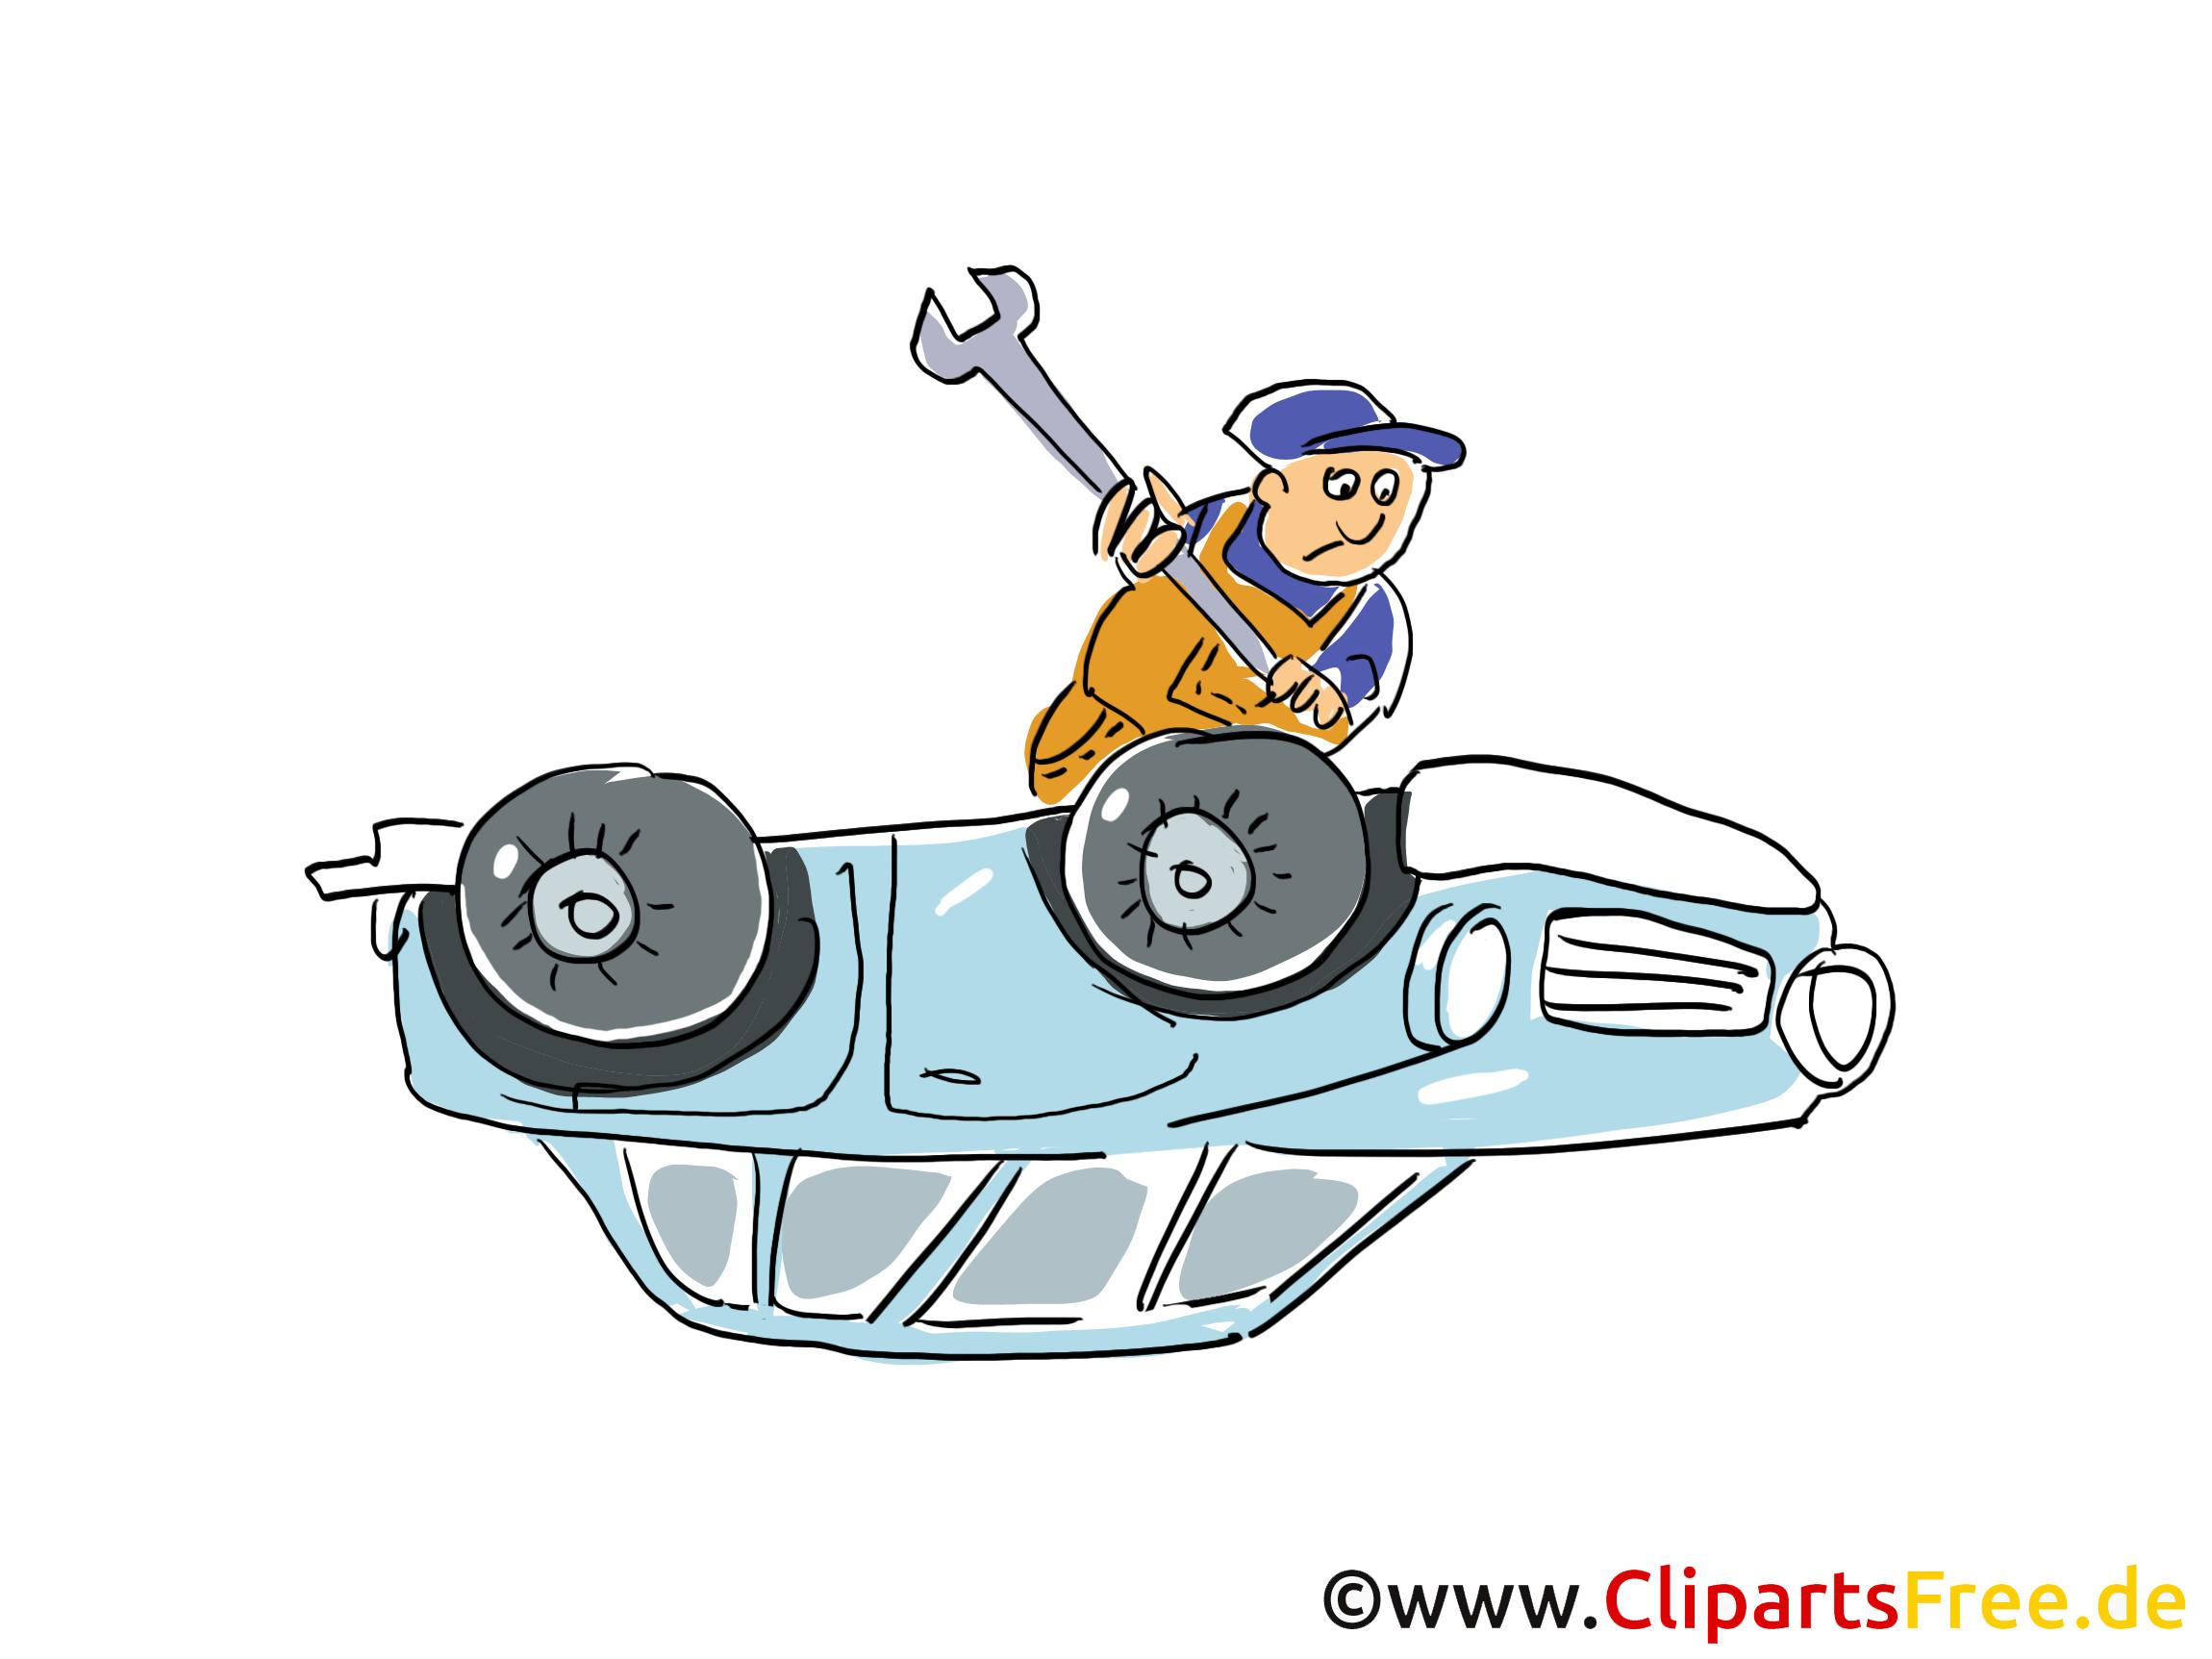 Autopanne Clipart, Bild, Grafik, Cartoon, Illustration gratis